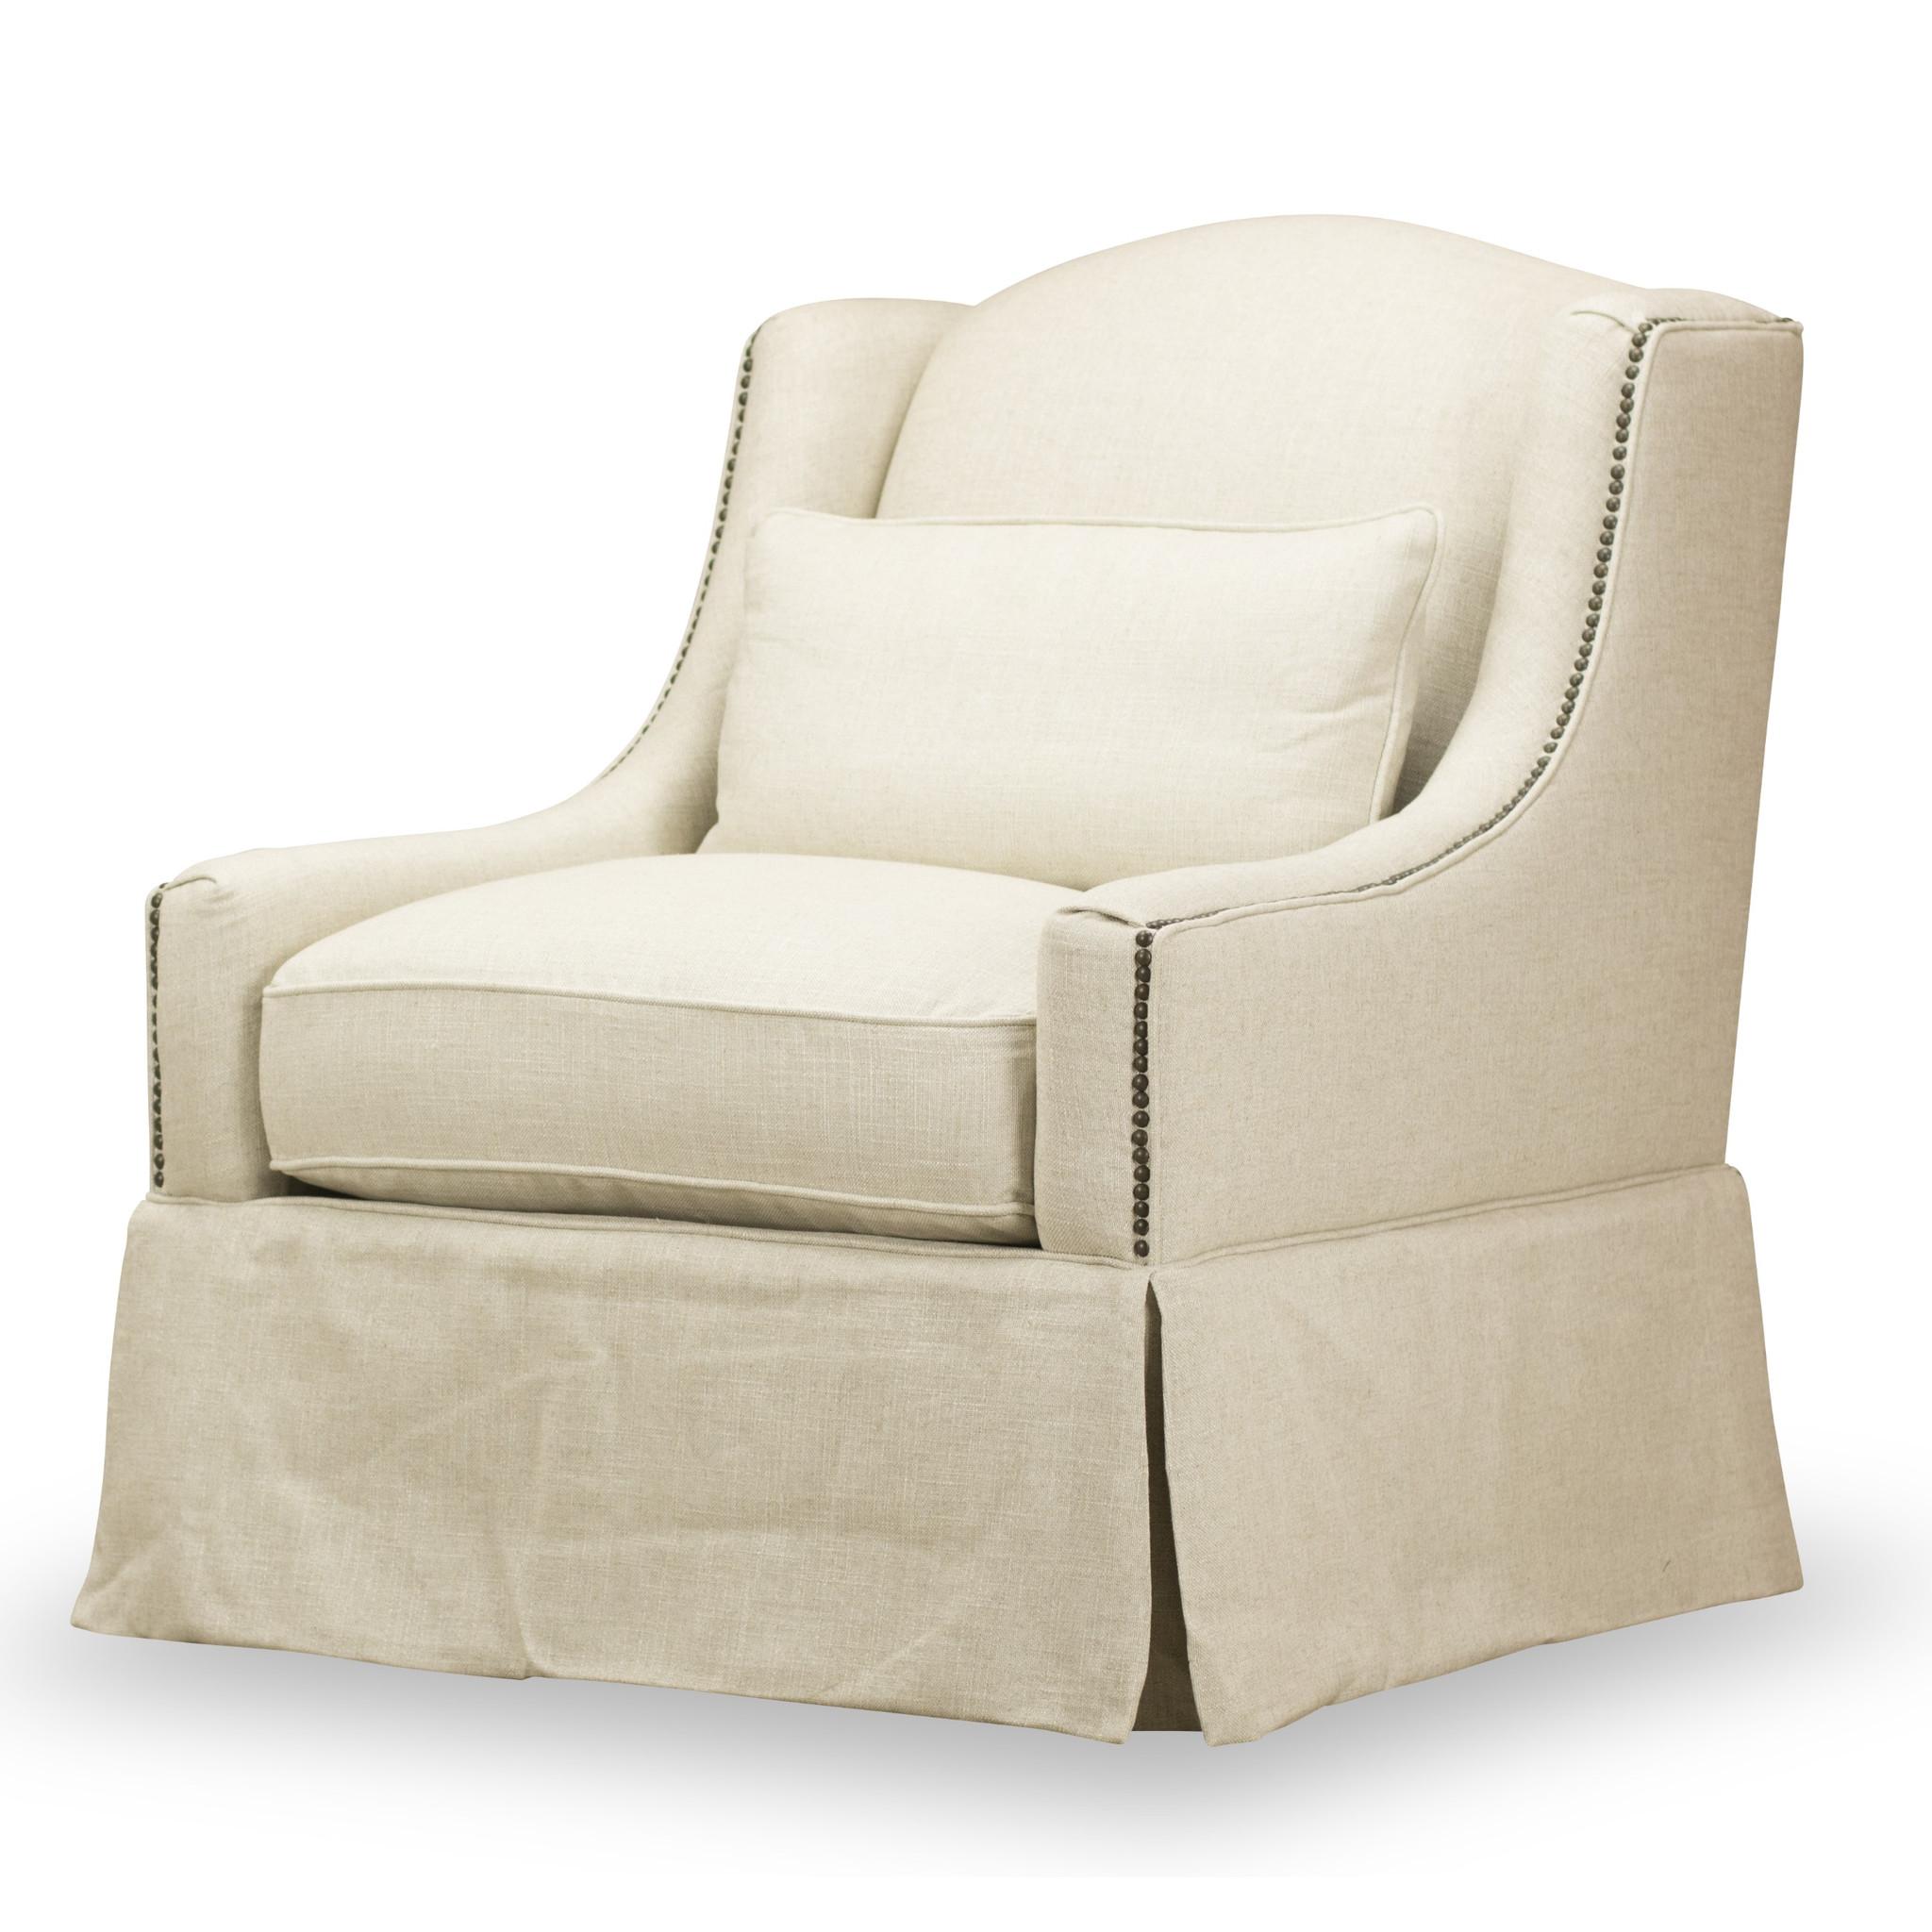 halston-chair-W-S3133-10-3385-99-natural-f3q